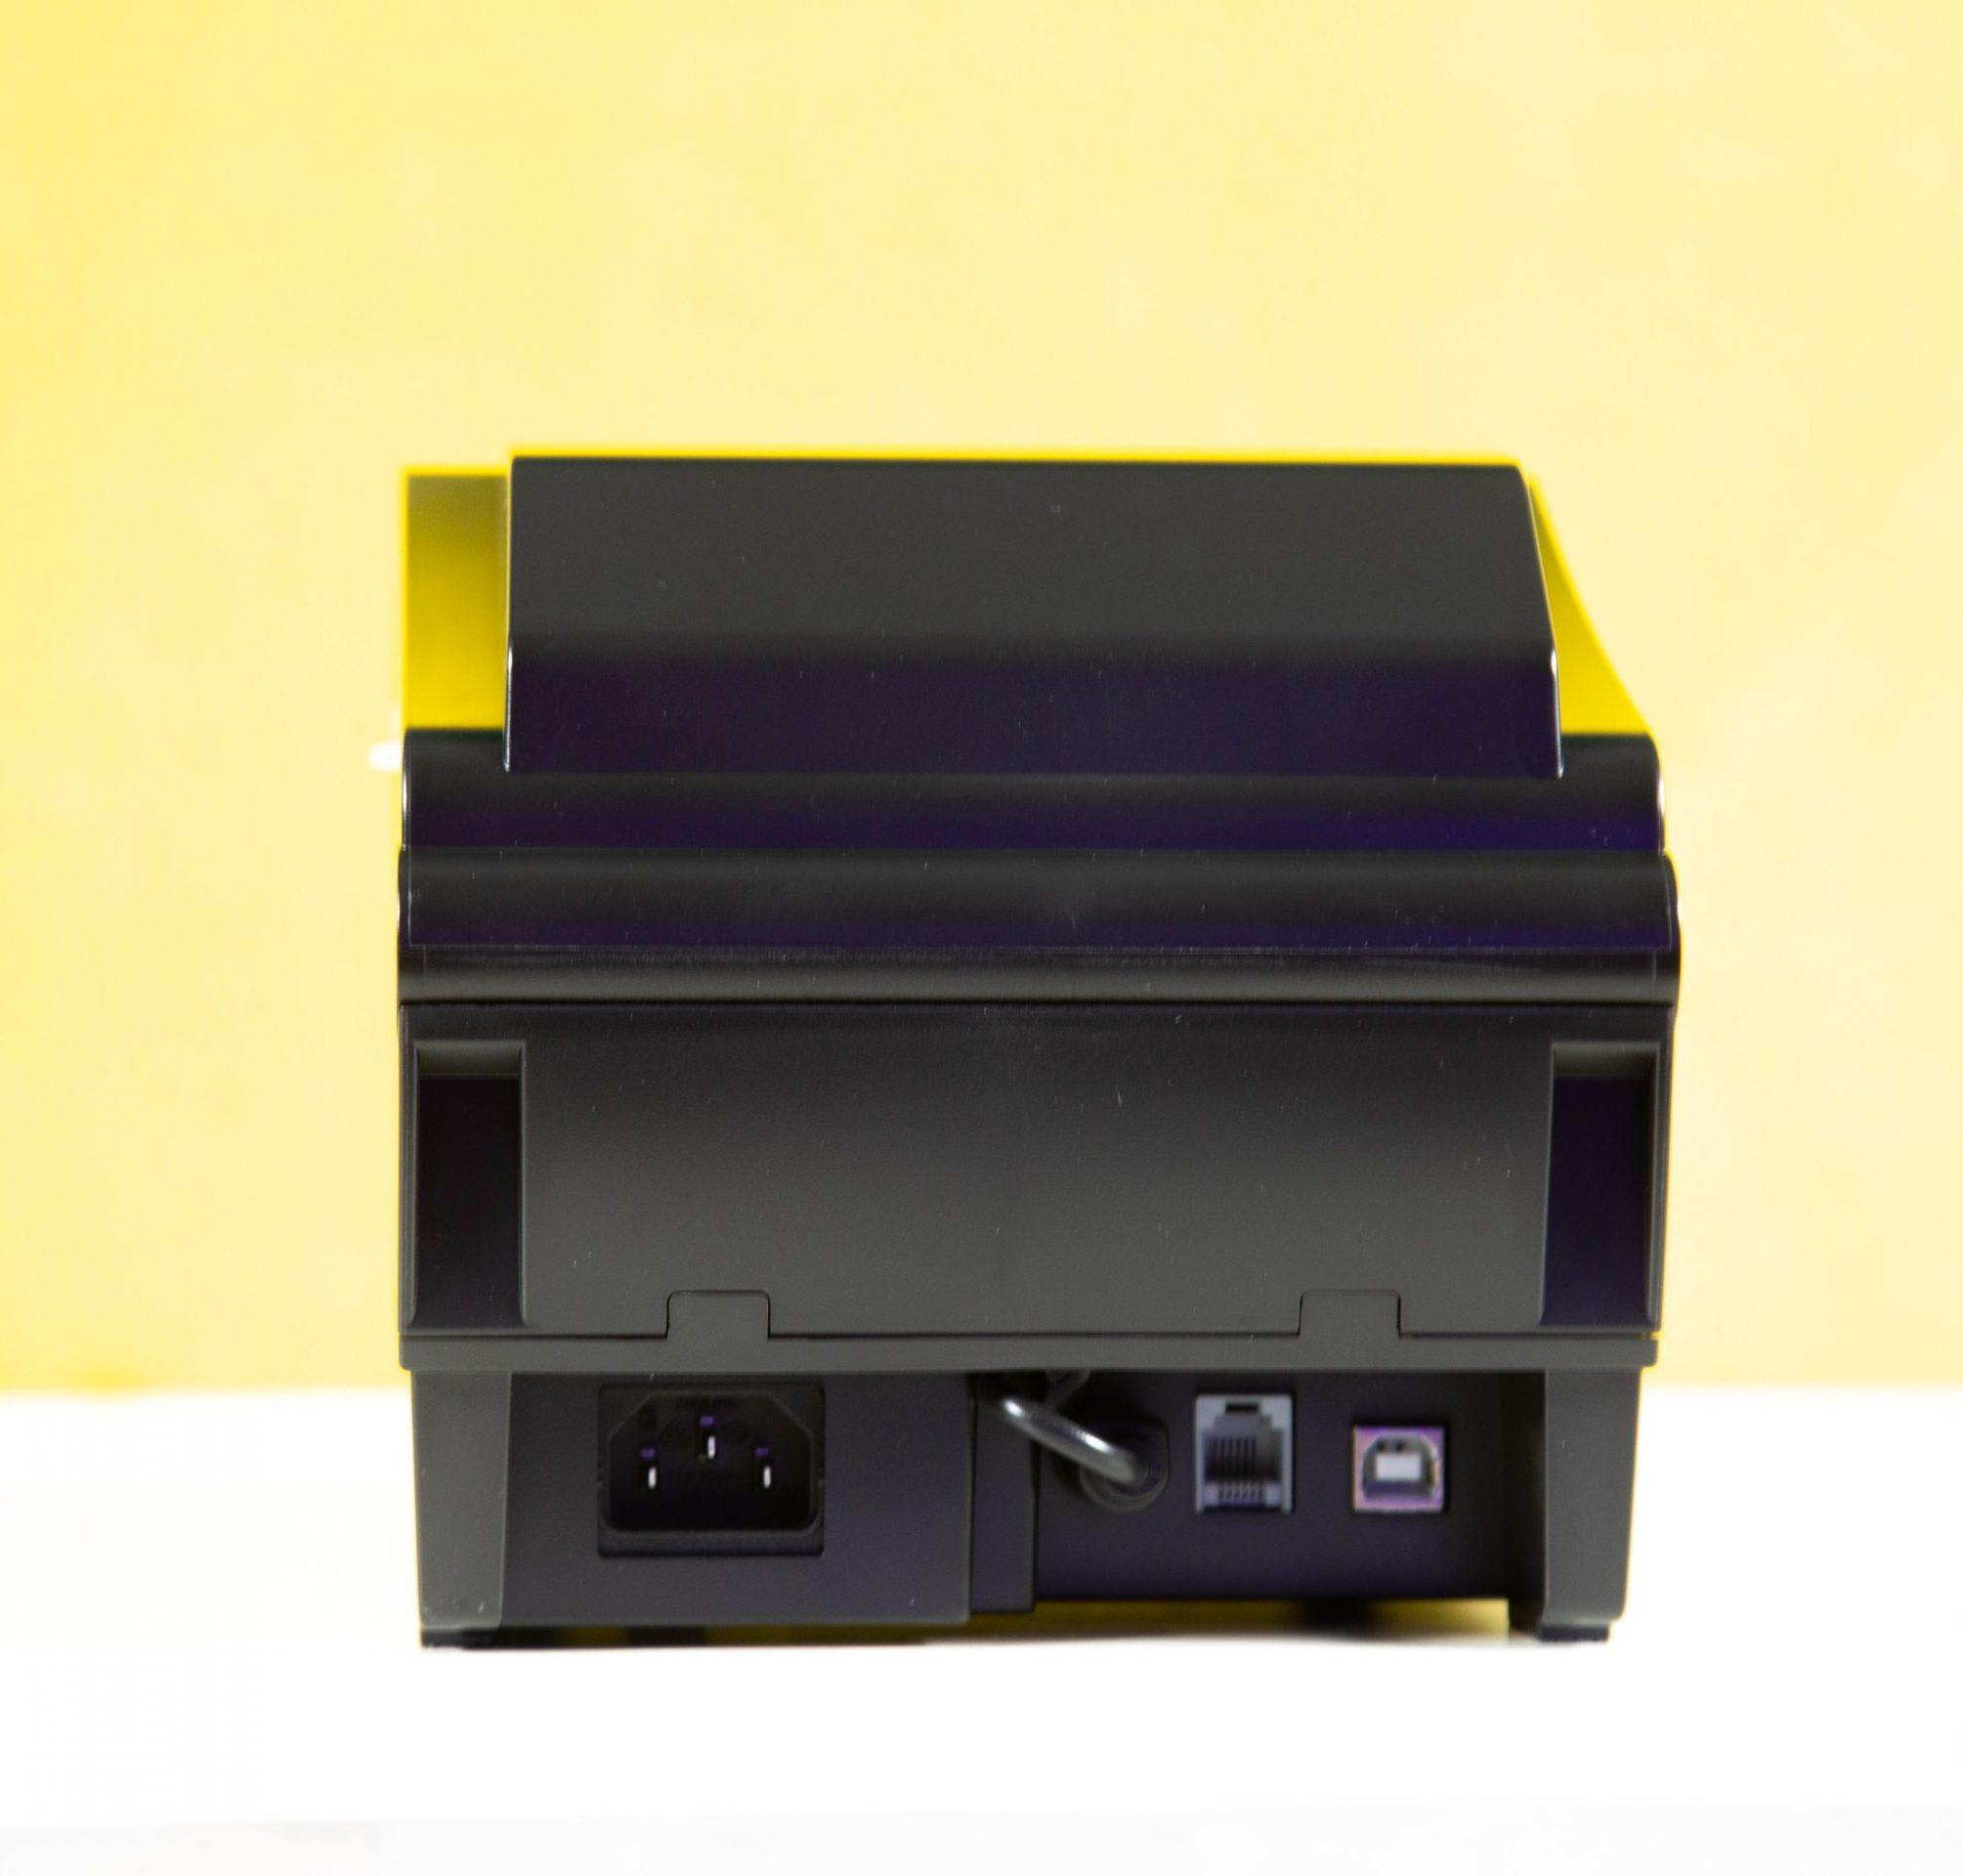 42198 may in tem nhan ma vach xprinter xp 365b hnc 8 1 scaled e1625415043365